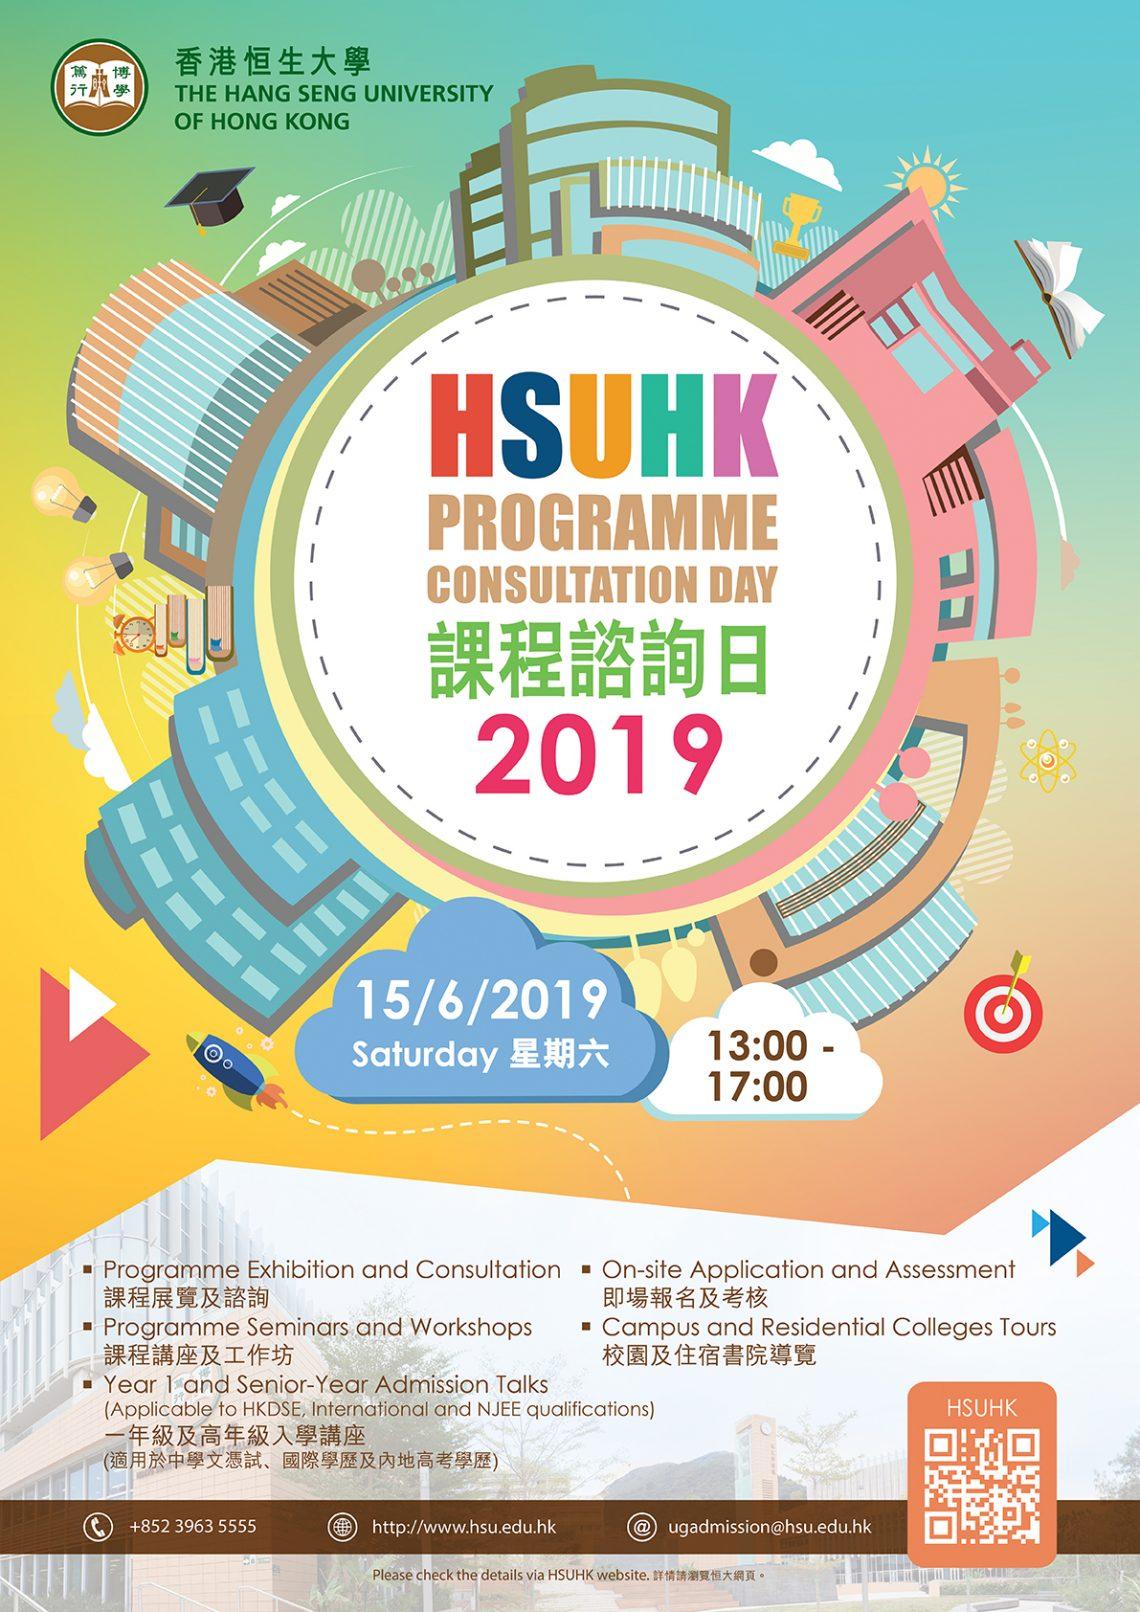 HSUHK Programme Consultation Day 2019